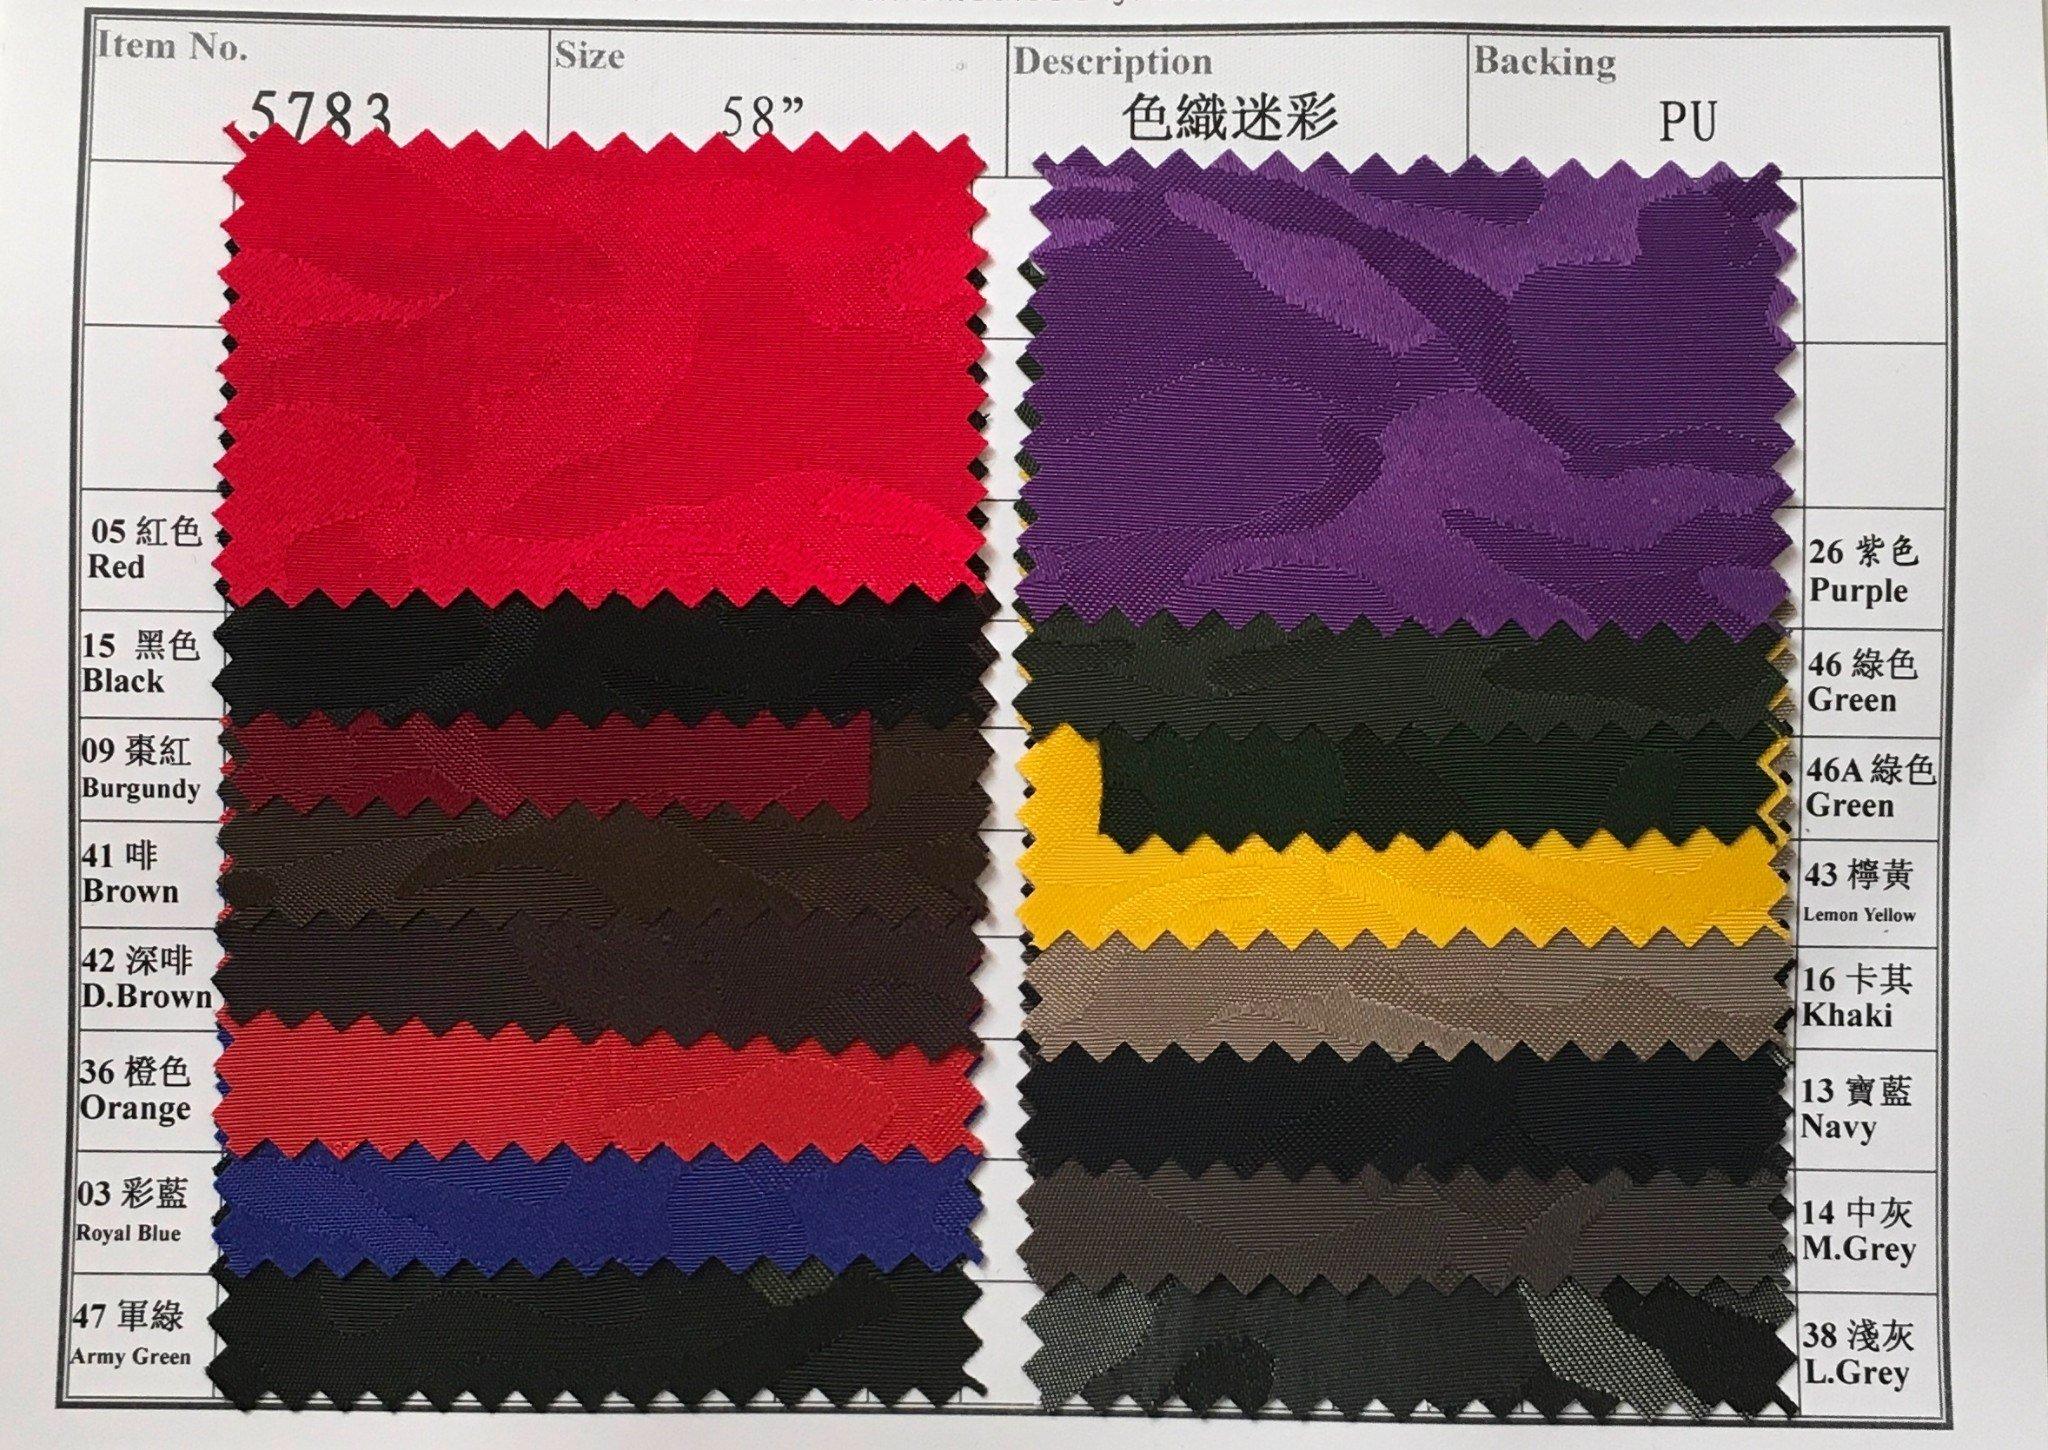 item 5783 300d poly camo jqd with pu coating